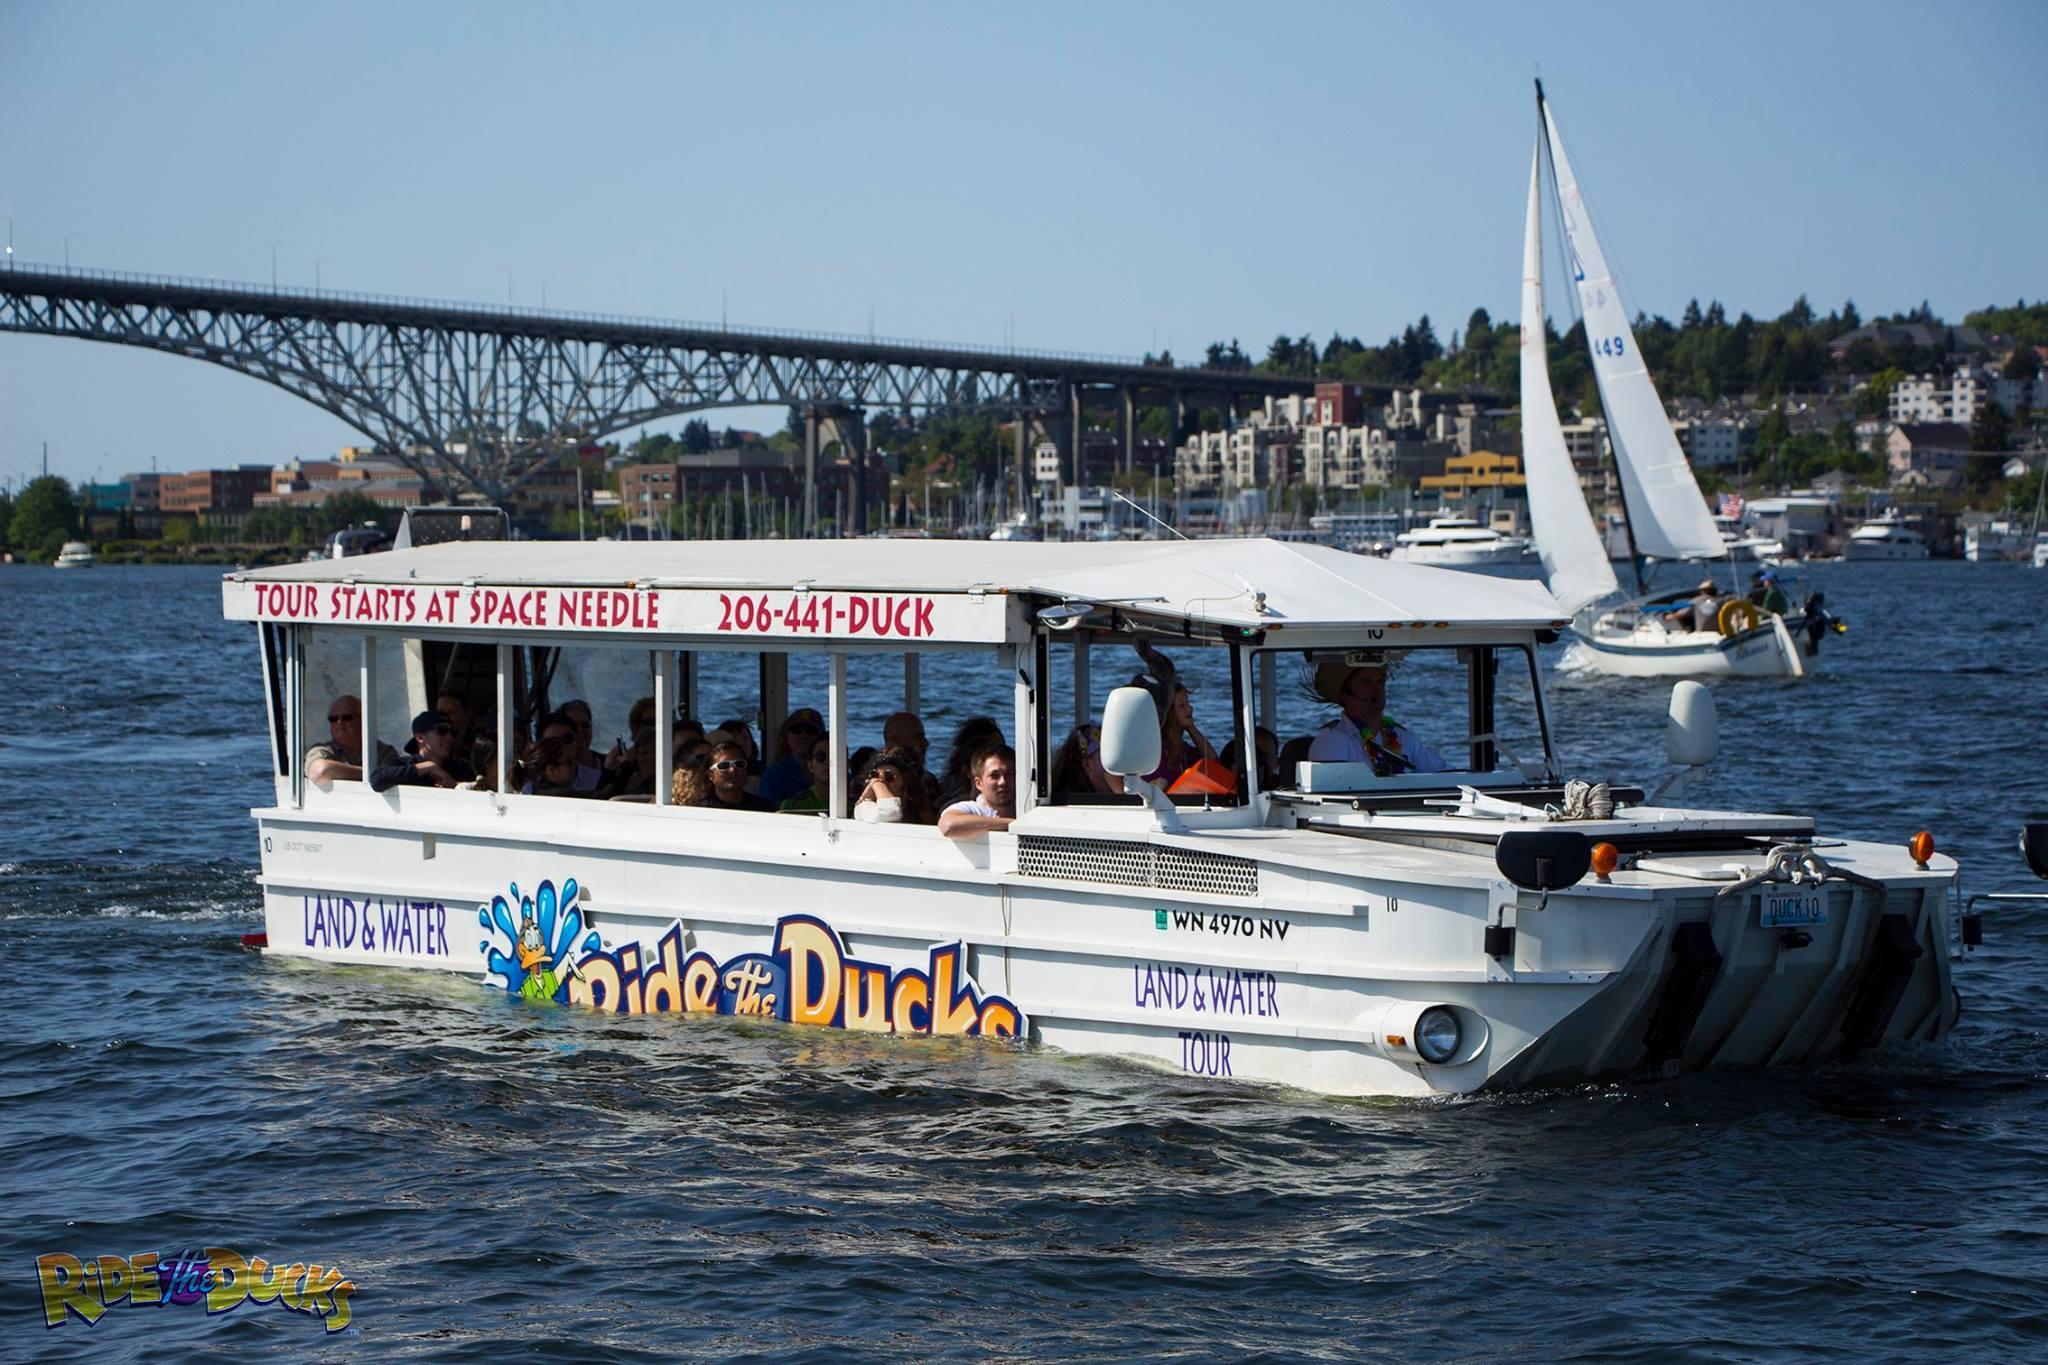 Tour The Ballard Bridge Seattle